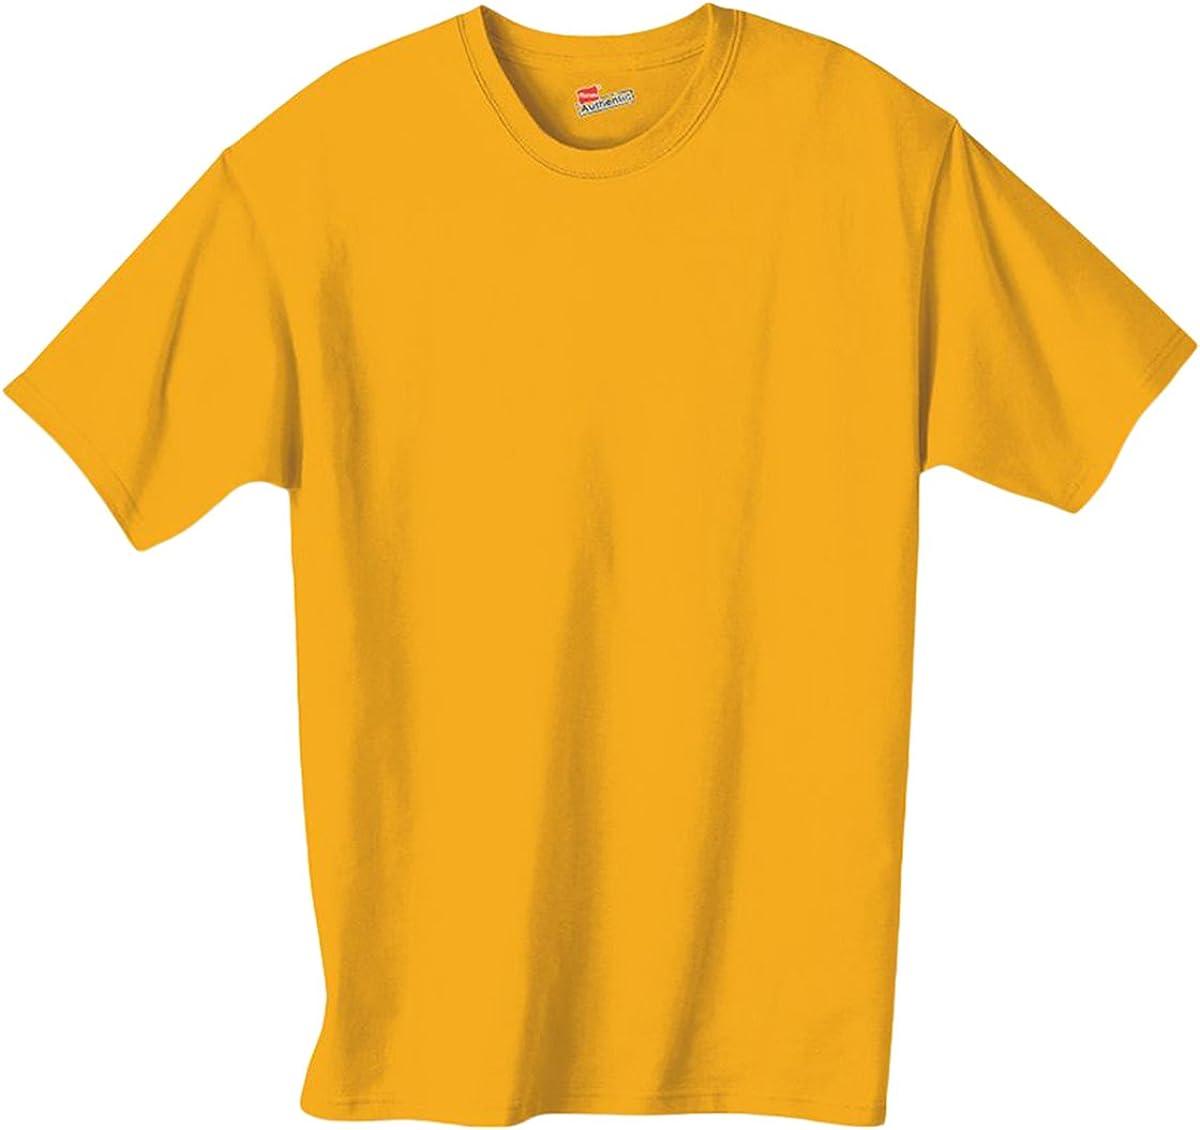 Hanes Authentic TAGLESS Boys' Cotton T-Shirt_Gold_L